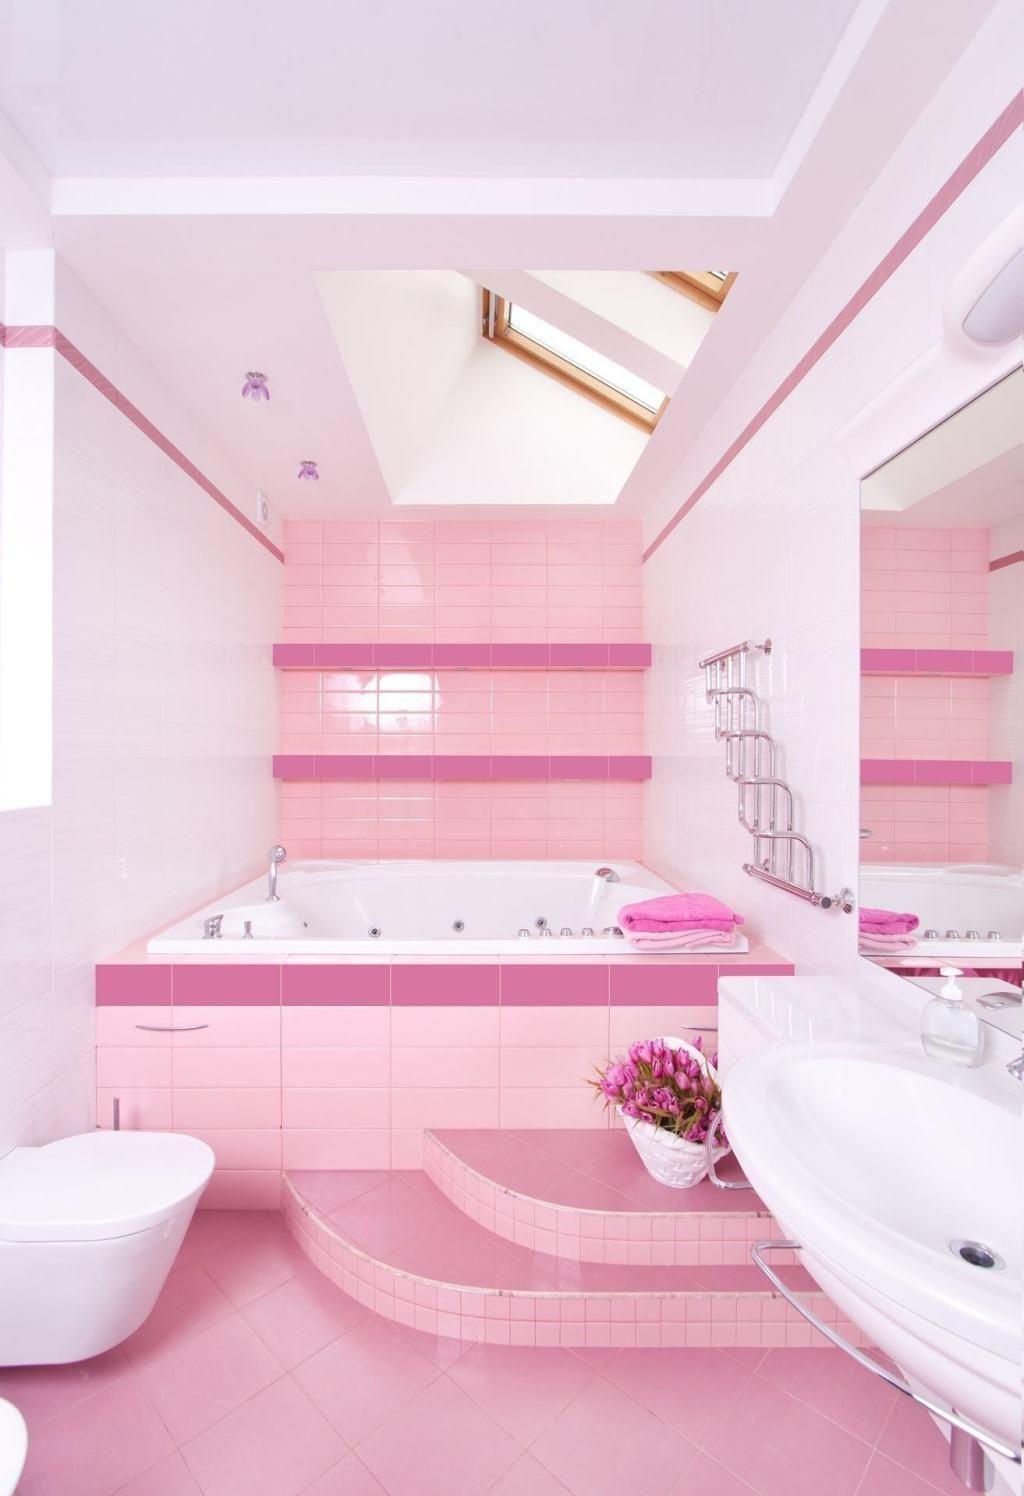 Rosa Badezimmer: 60+ Designs & Dekoration Fotos | Rosa ...